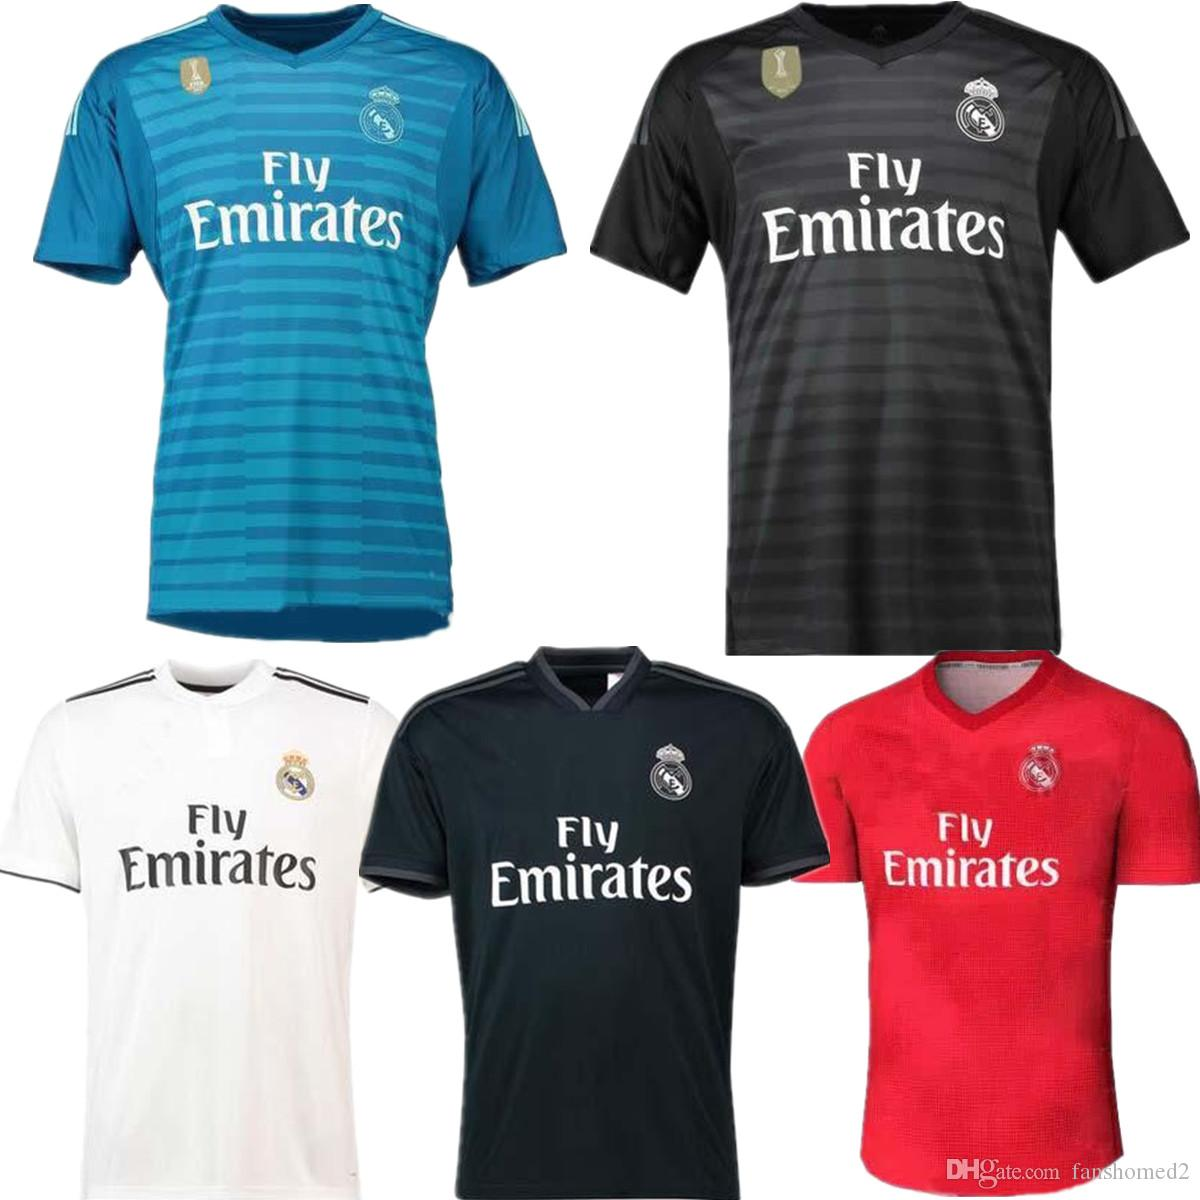 2018 2019 Real Madrid   1 25 Courtois Portero Camiseta De Visitante Tercer  Rojo Varane Bale Camisetas De Fútbol De Isco Navas Arsensio Modric BENZEMA  ... 8e5fa623c7ebd